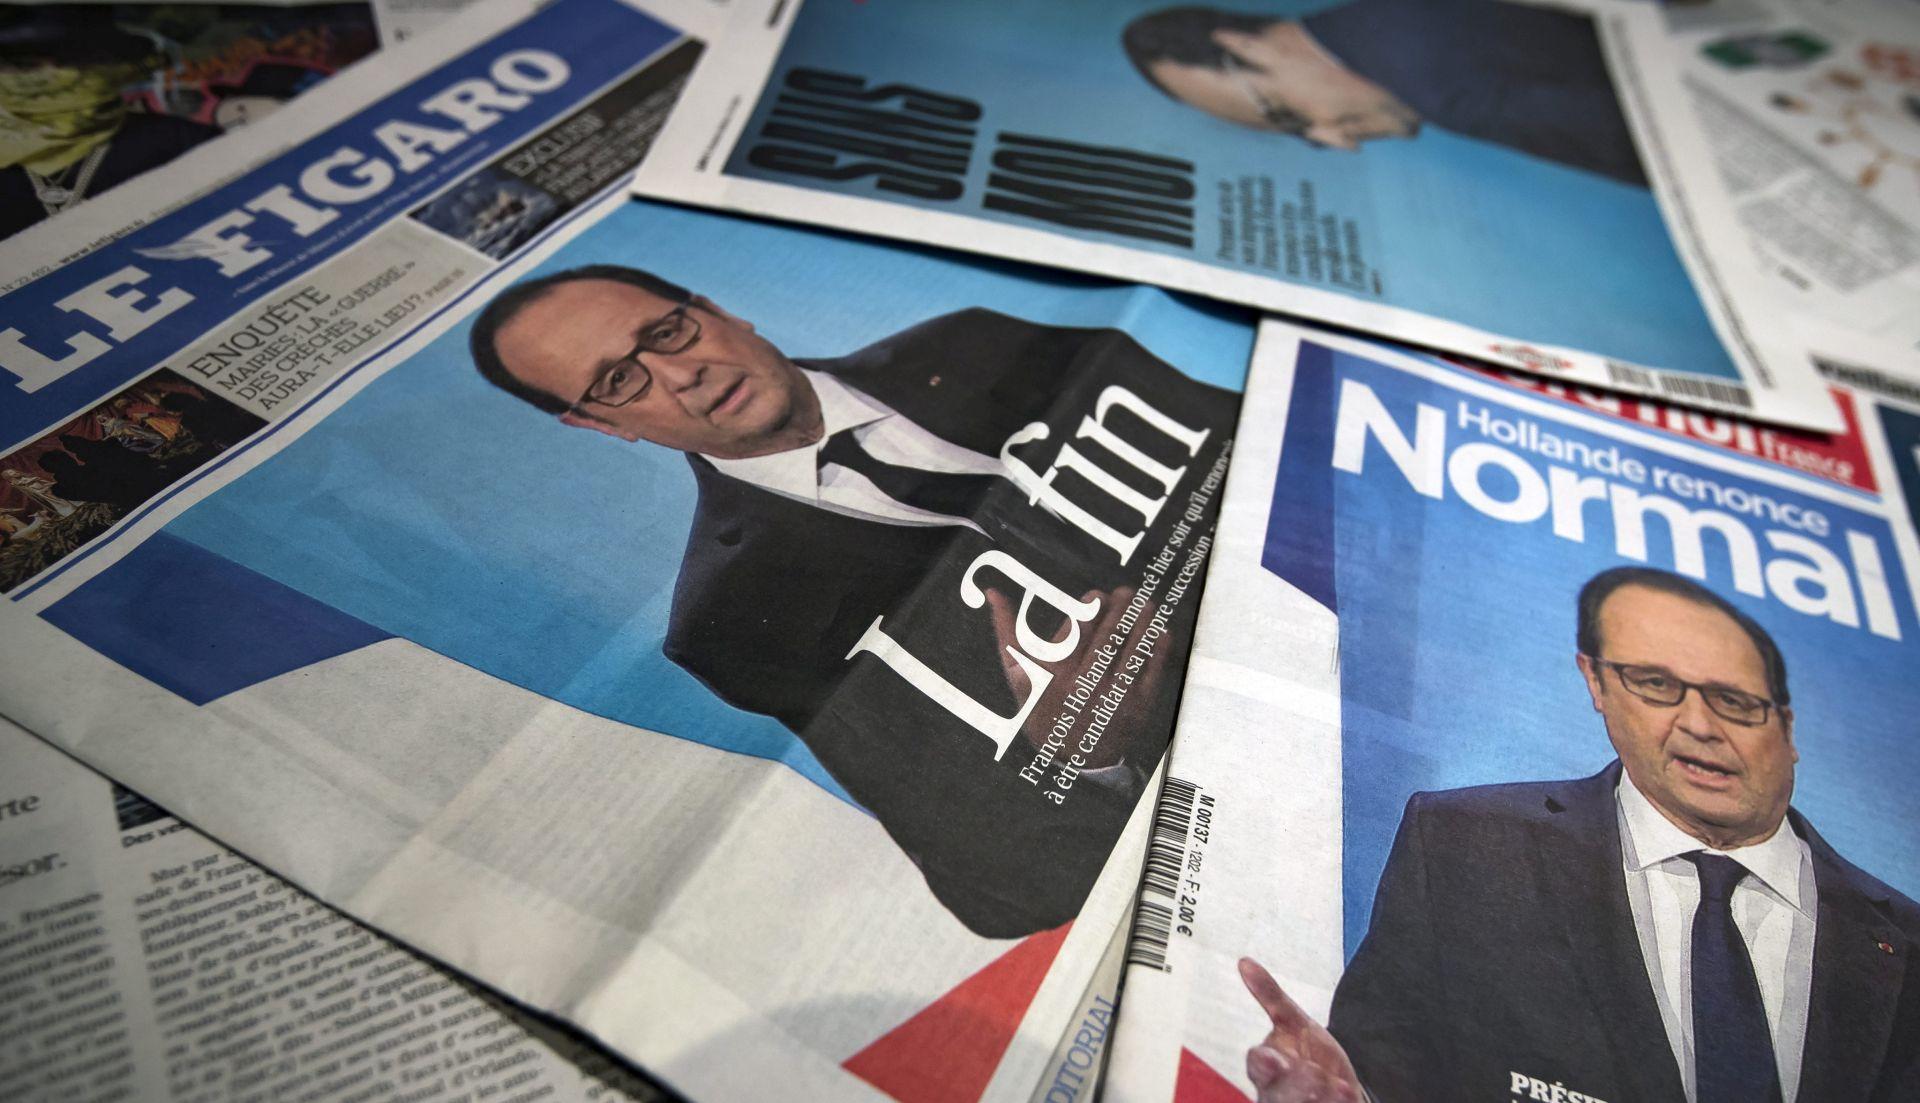 Hollandeov mandat obilježili teroristički napadi, masovni prosvjedi i ljubavni jadi